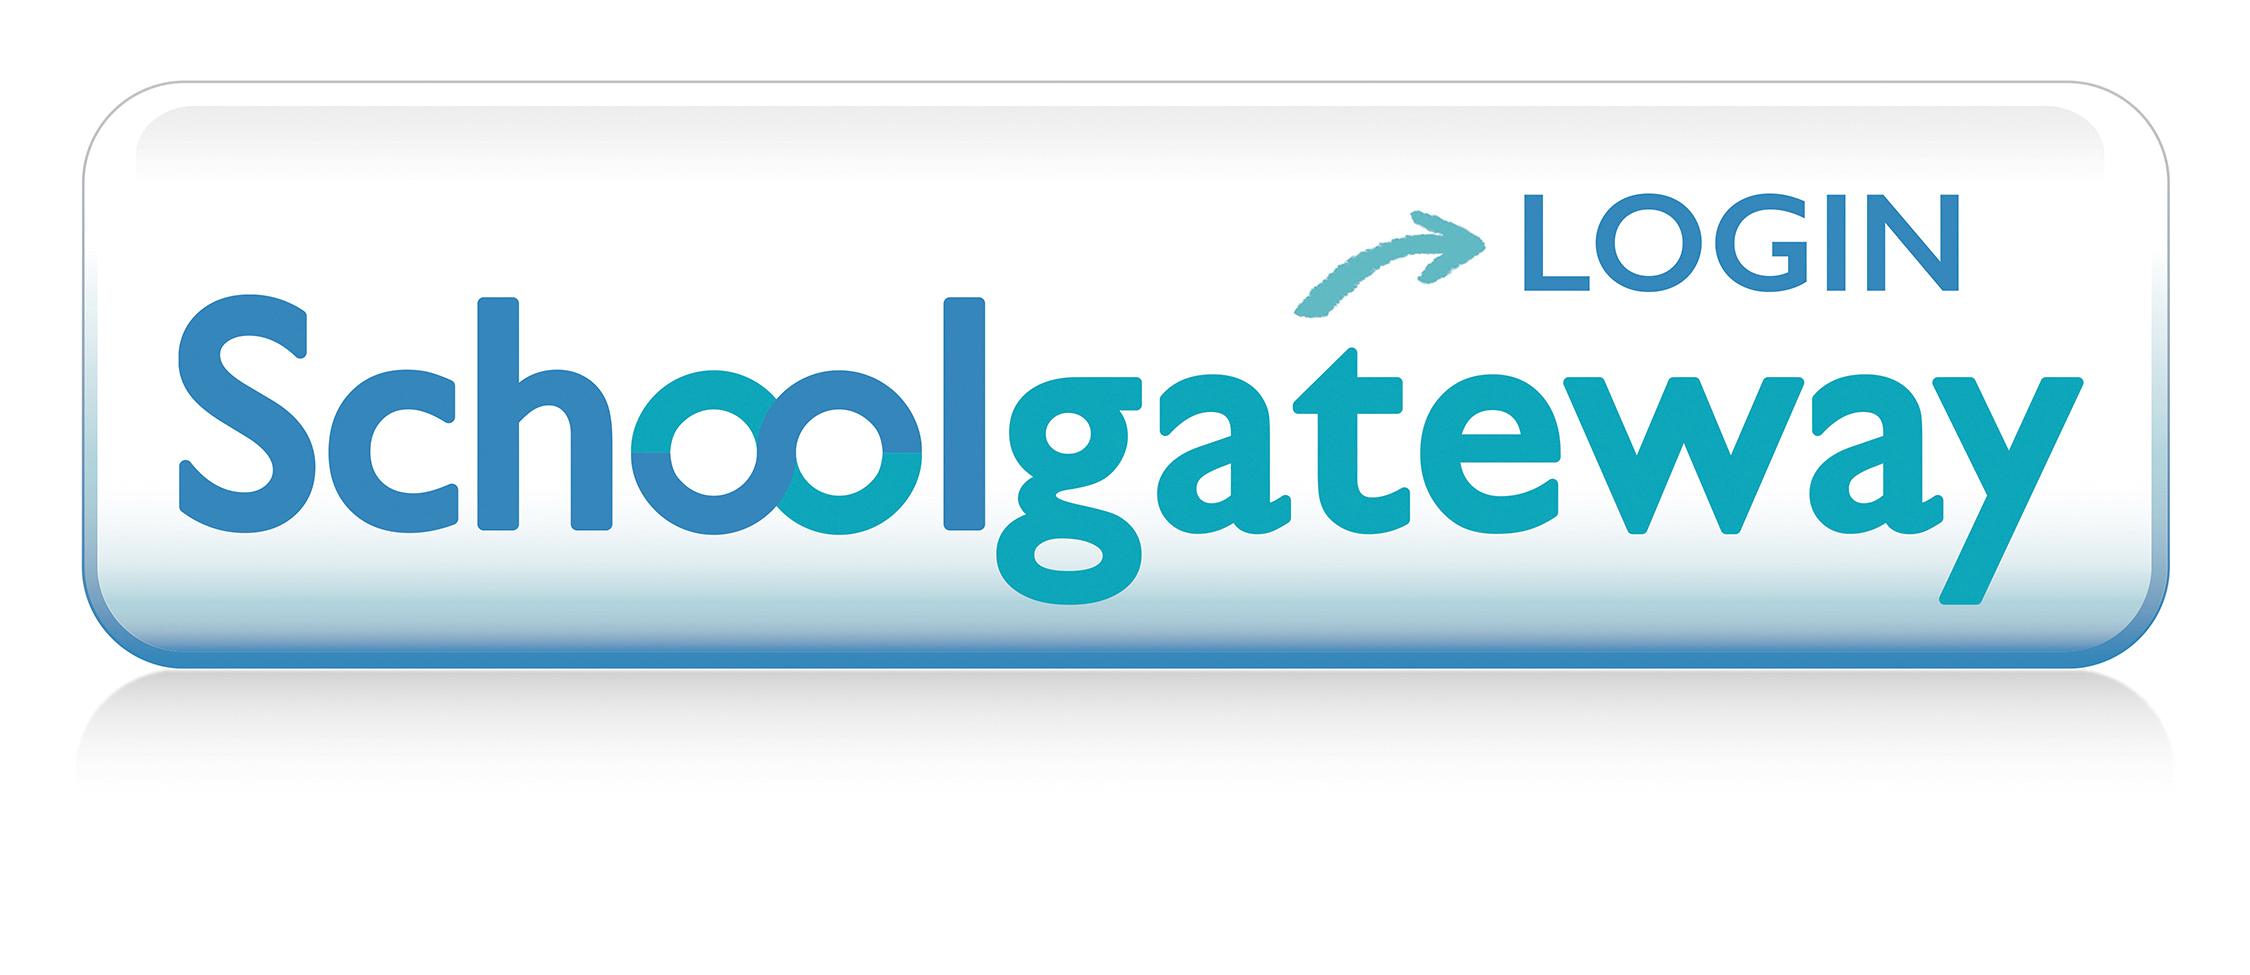 SG login button